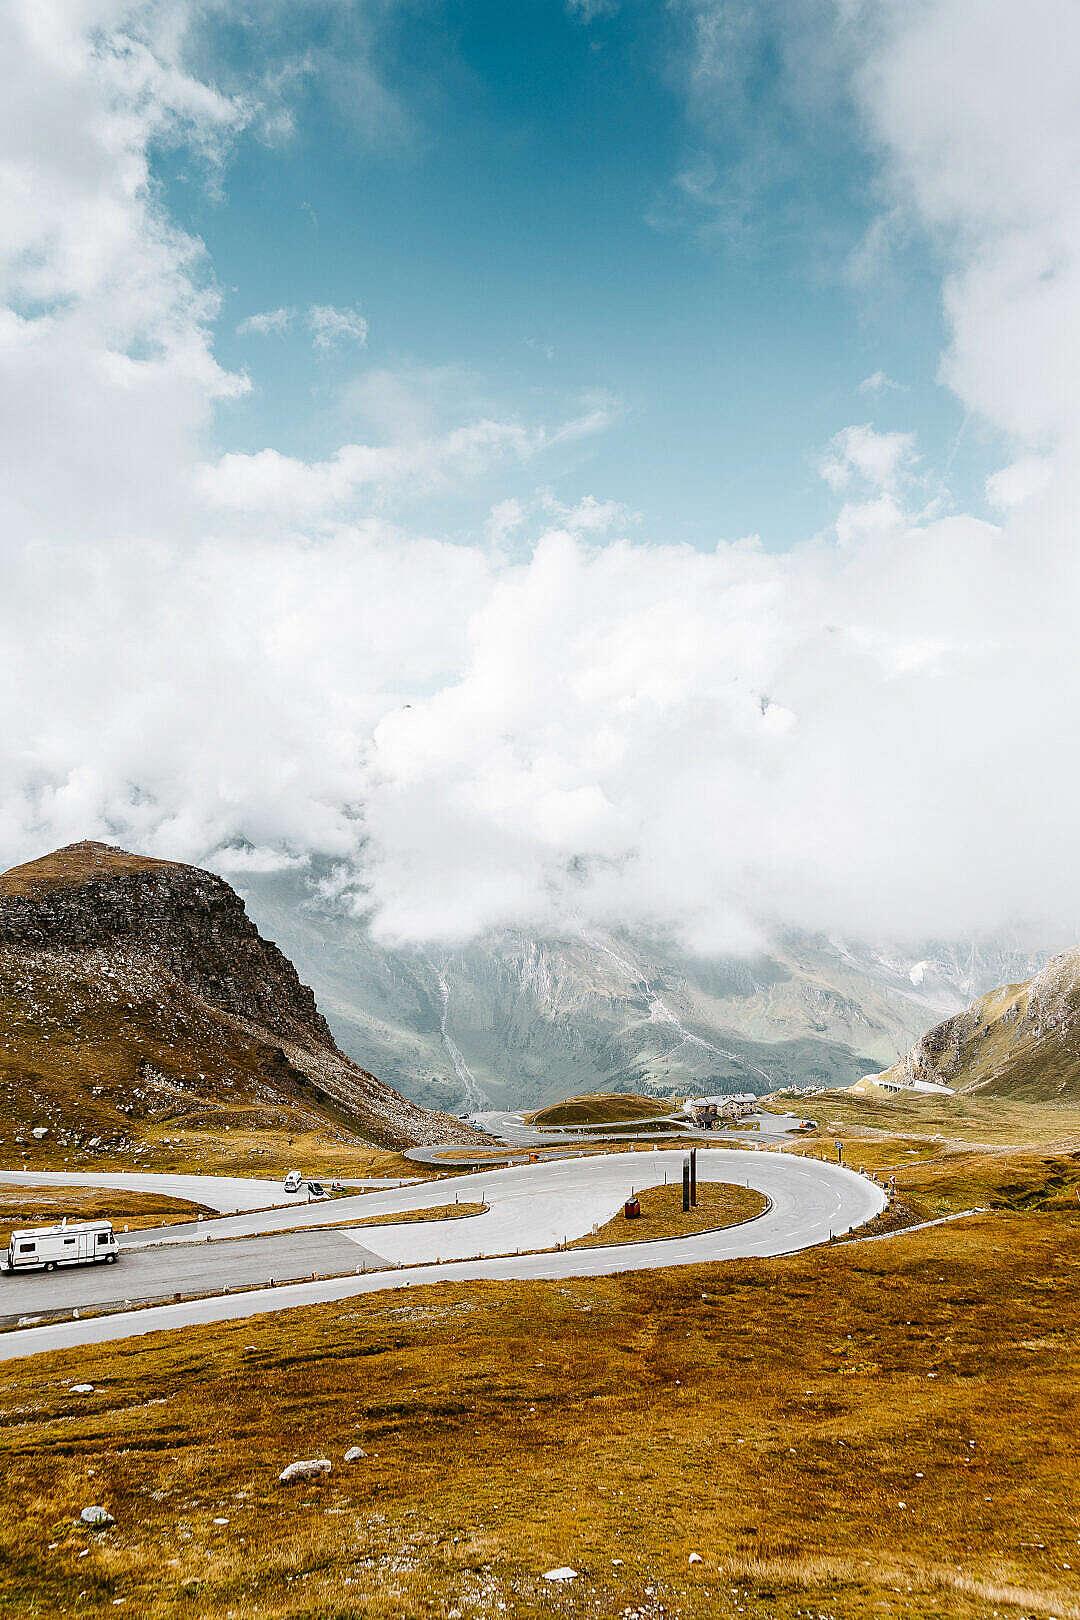 Download ZigZag Turns on Grossglockner High Alpine Road, Austria FREE Stock Photo